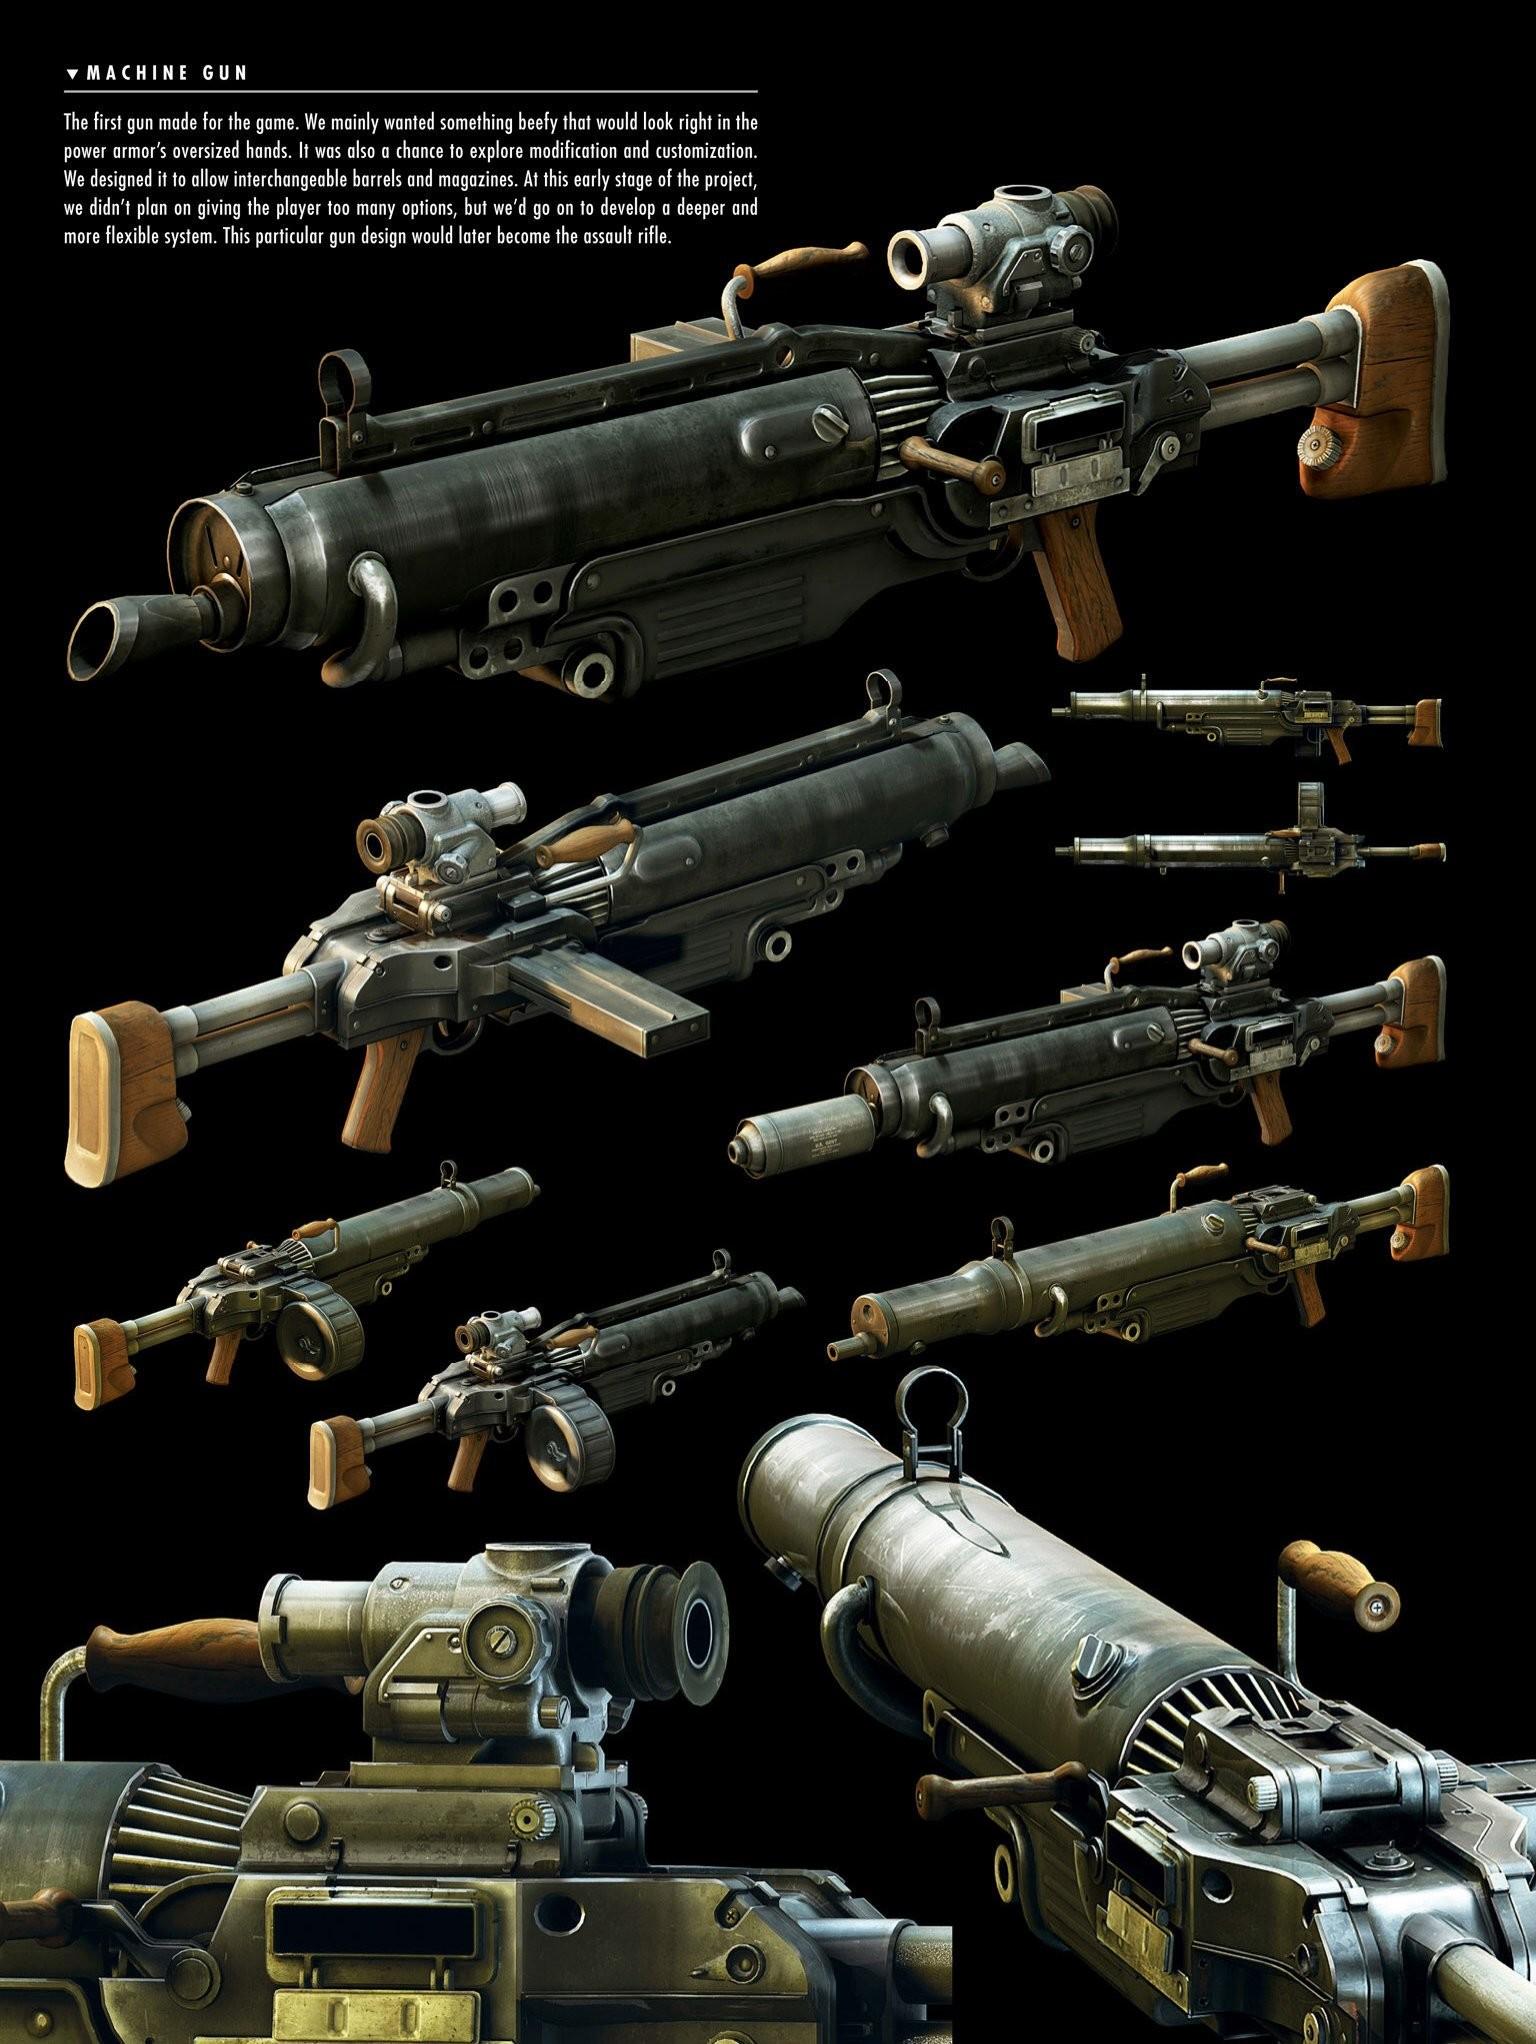 1920x1080 Gun Weapon Guns Weapons Rifle Military Machine Assault Police Swat Wallpaper At 3d Wallpapers